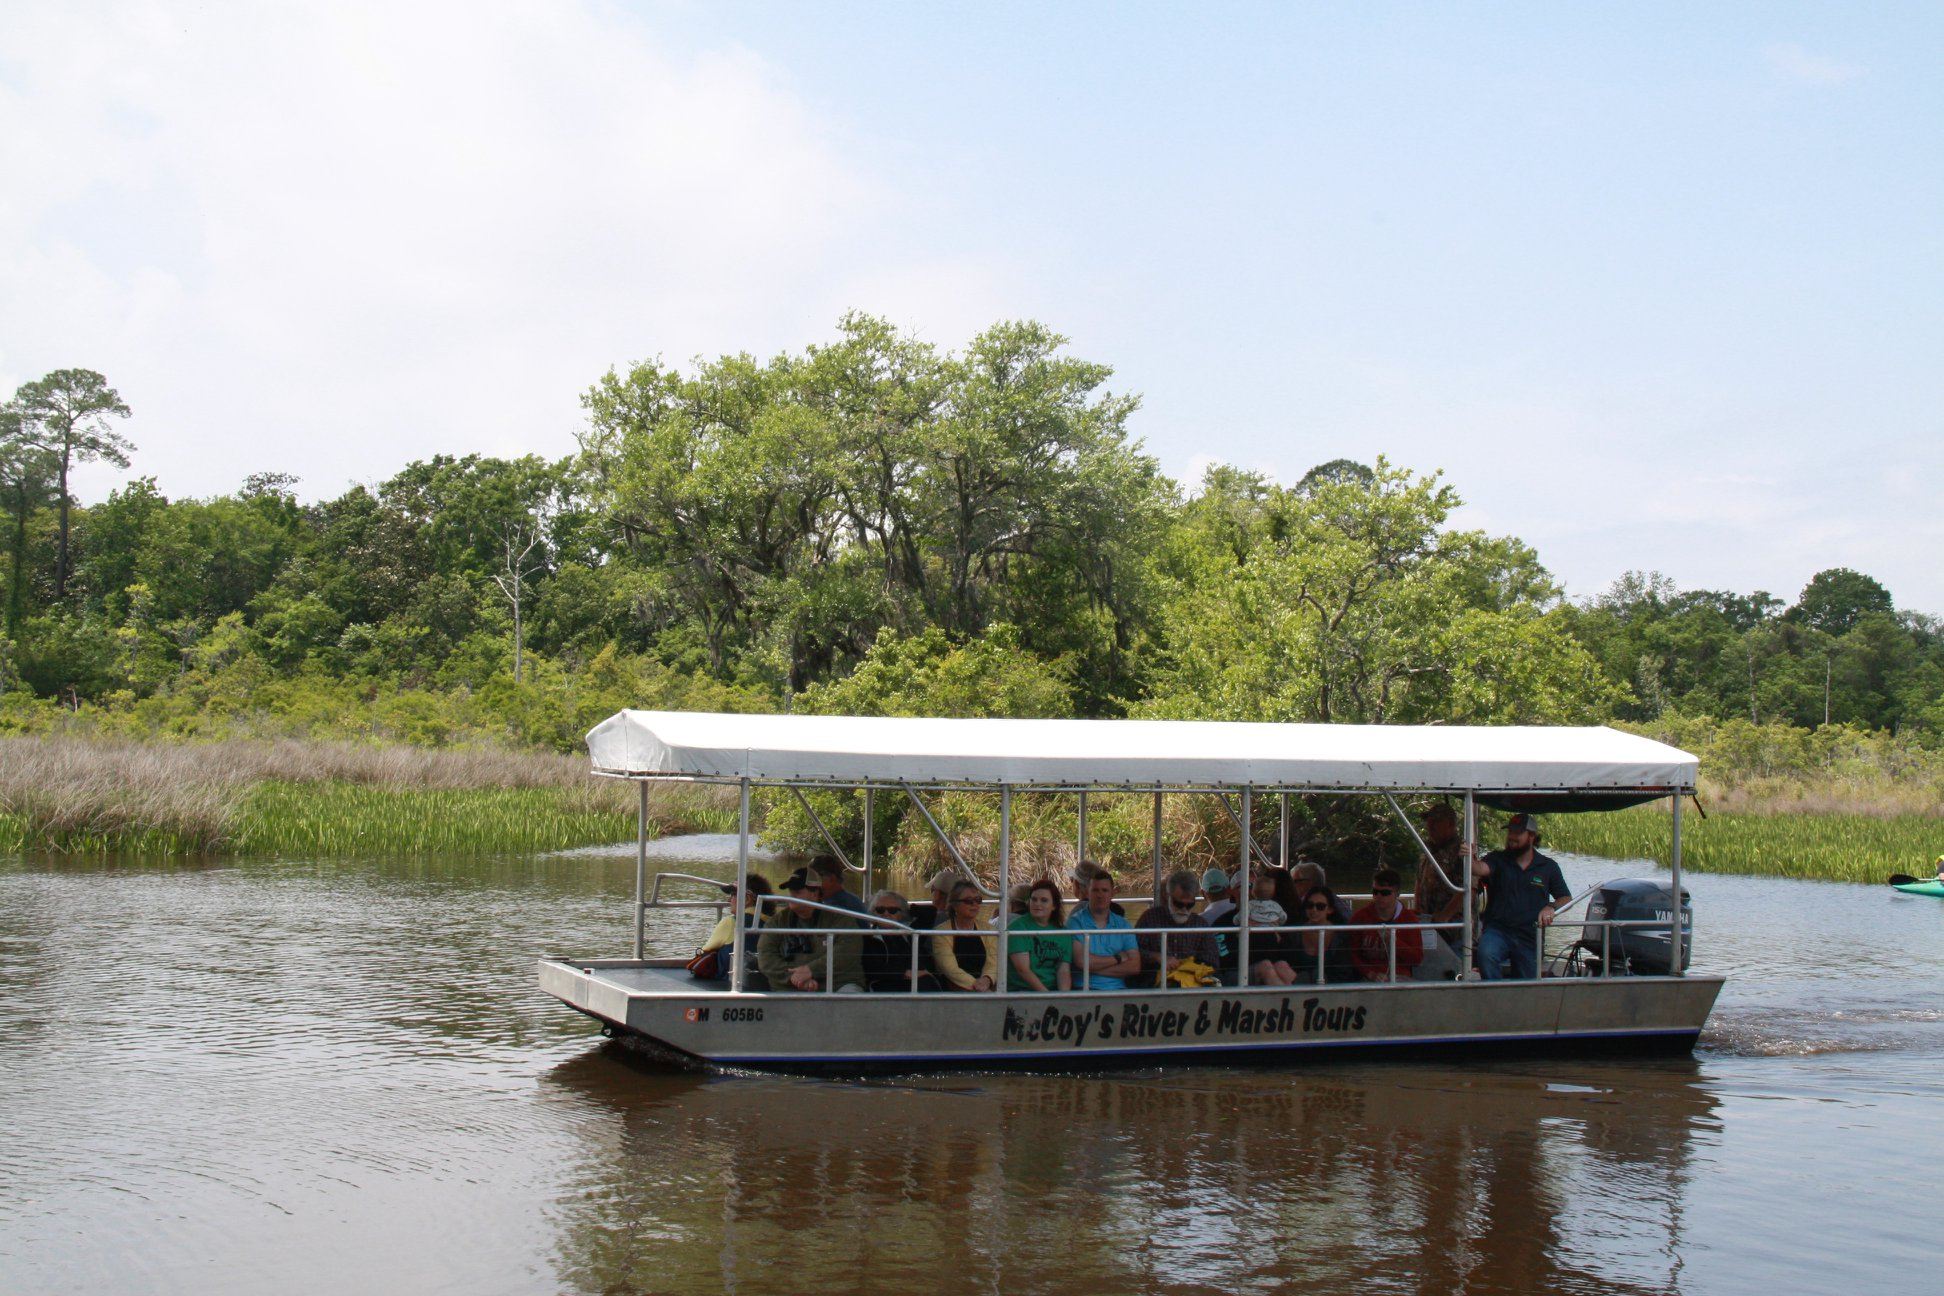 pascagoula river audubon center mccoy's river and marsh tours.jpg